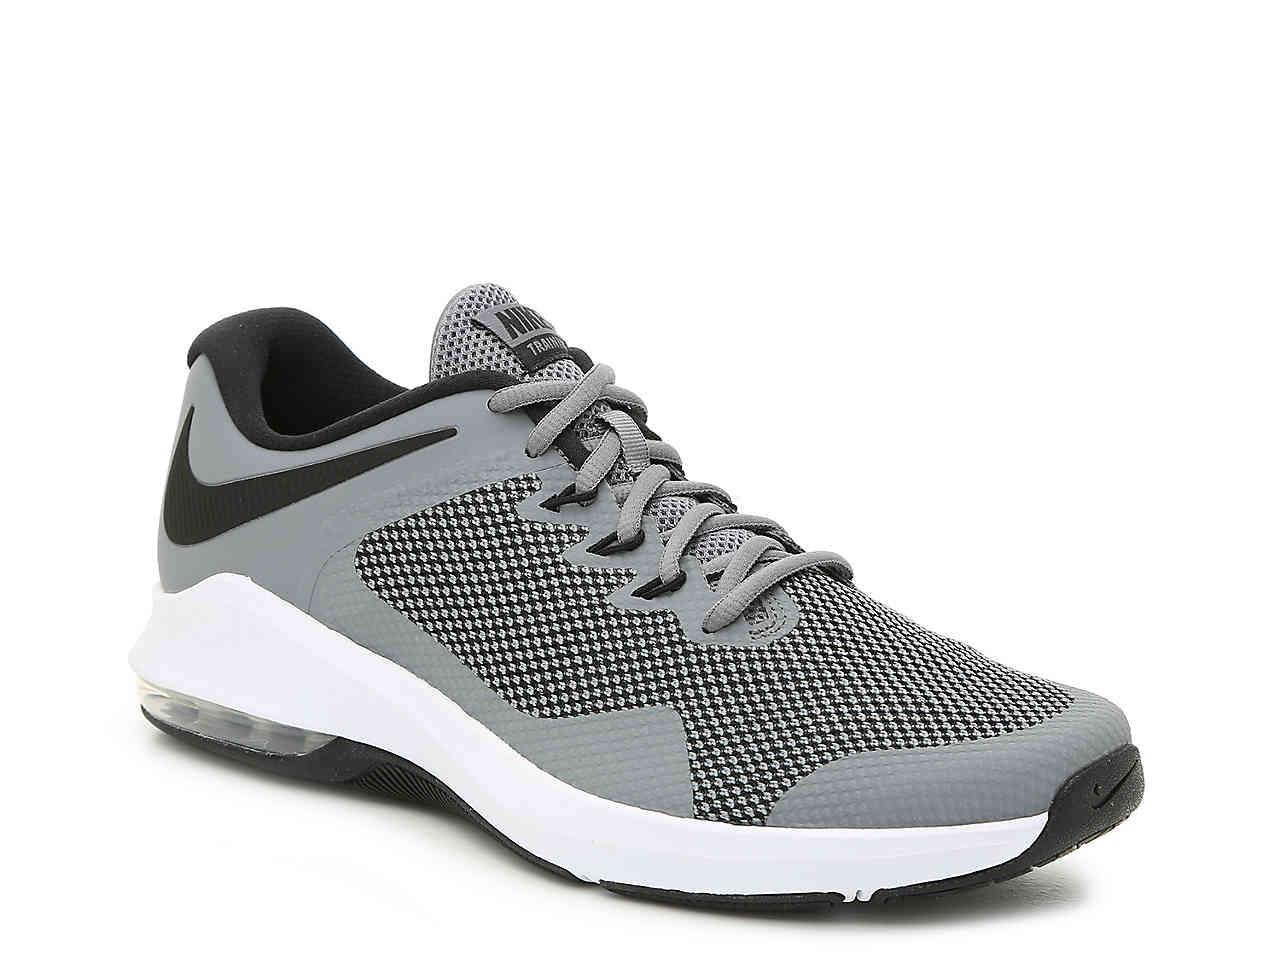 Lyst - Nike Air Max Alpha Trainer (black white) Men s Cross Training ... c25b8aaca1